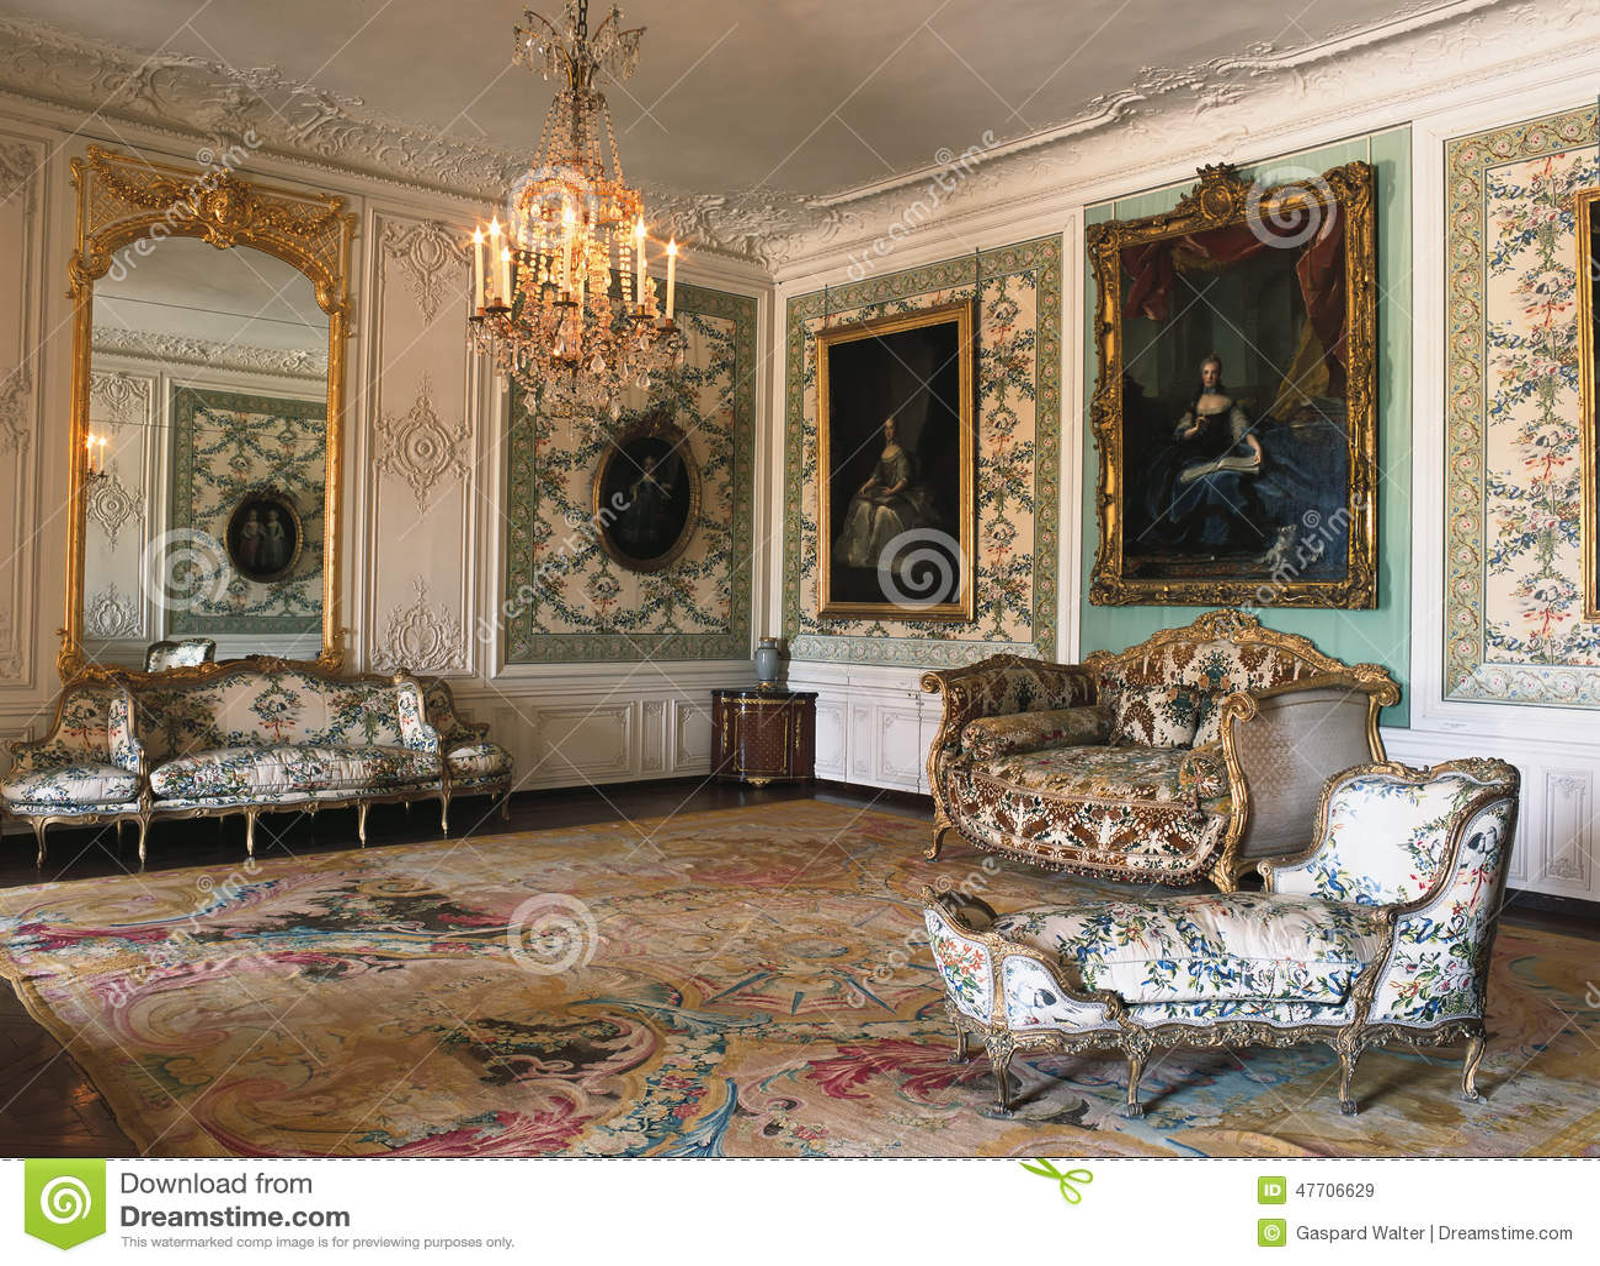 spiegel mbel amazing excellent spiegel modern gorgeous on modern design with luxus spiegel mbel. Black Bedroom Furniture Sets. Home Design Ideas